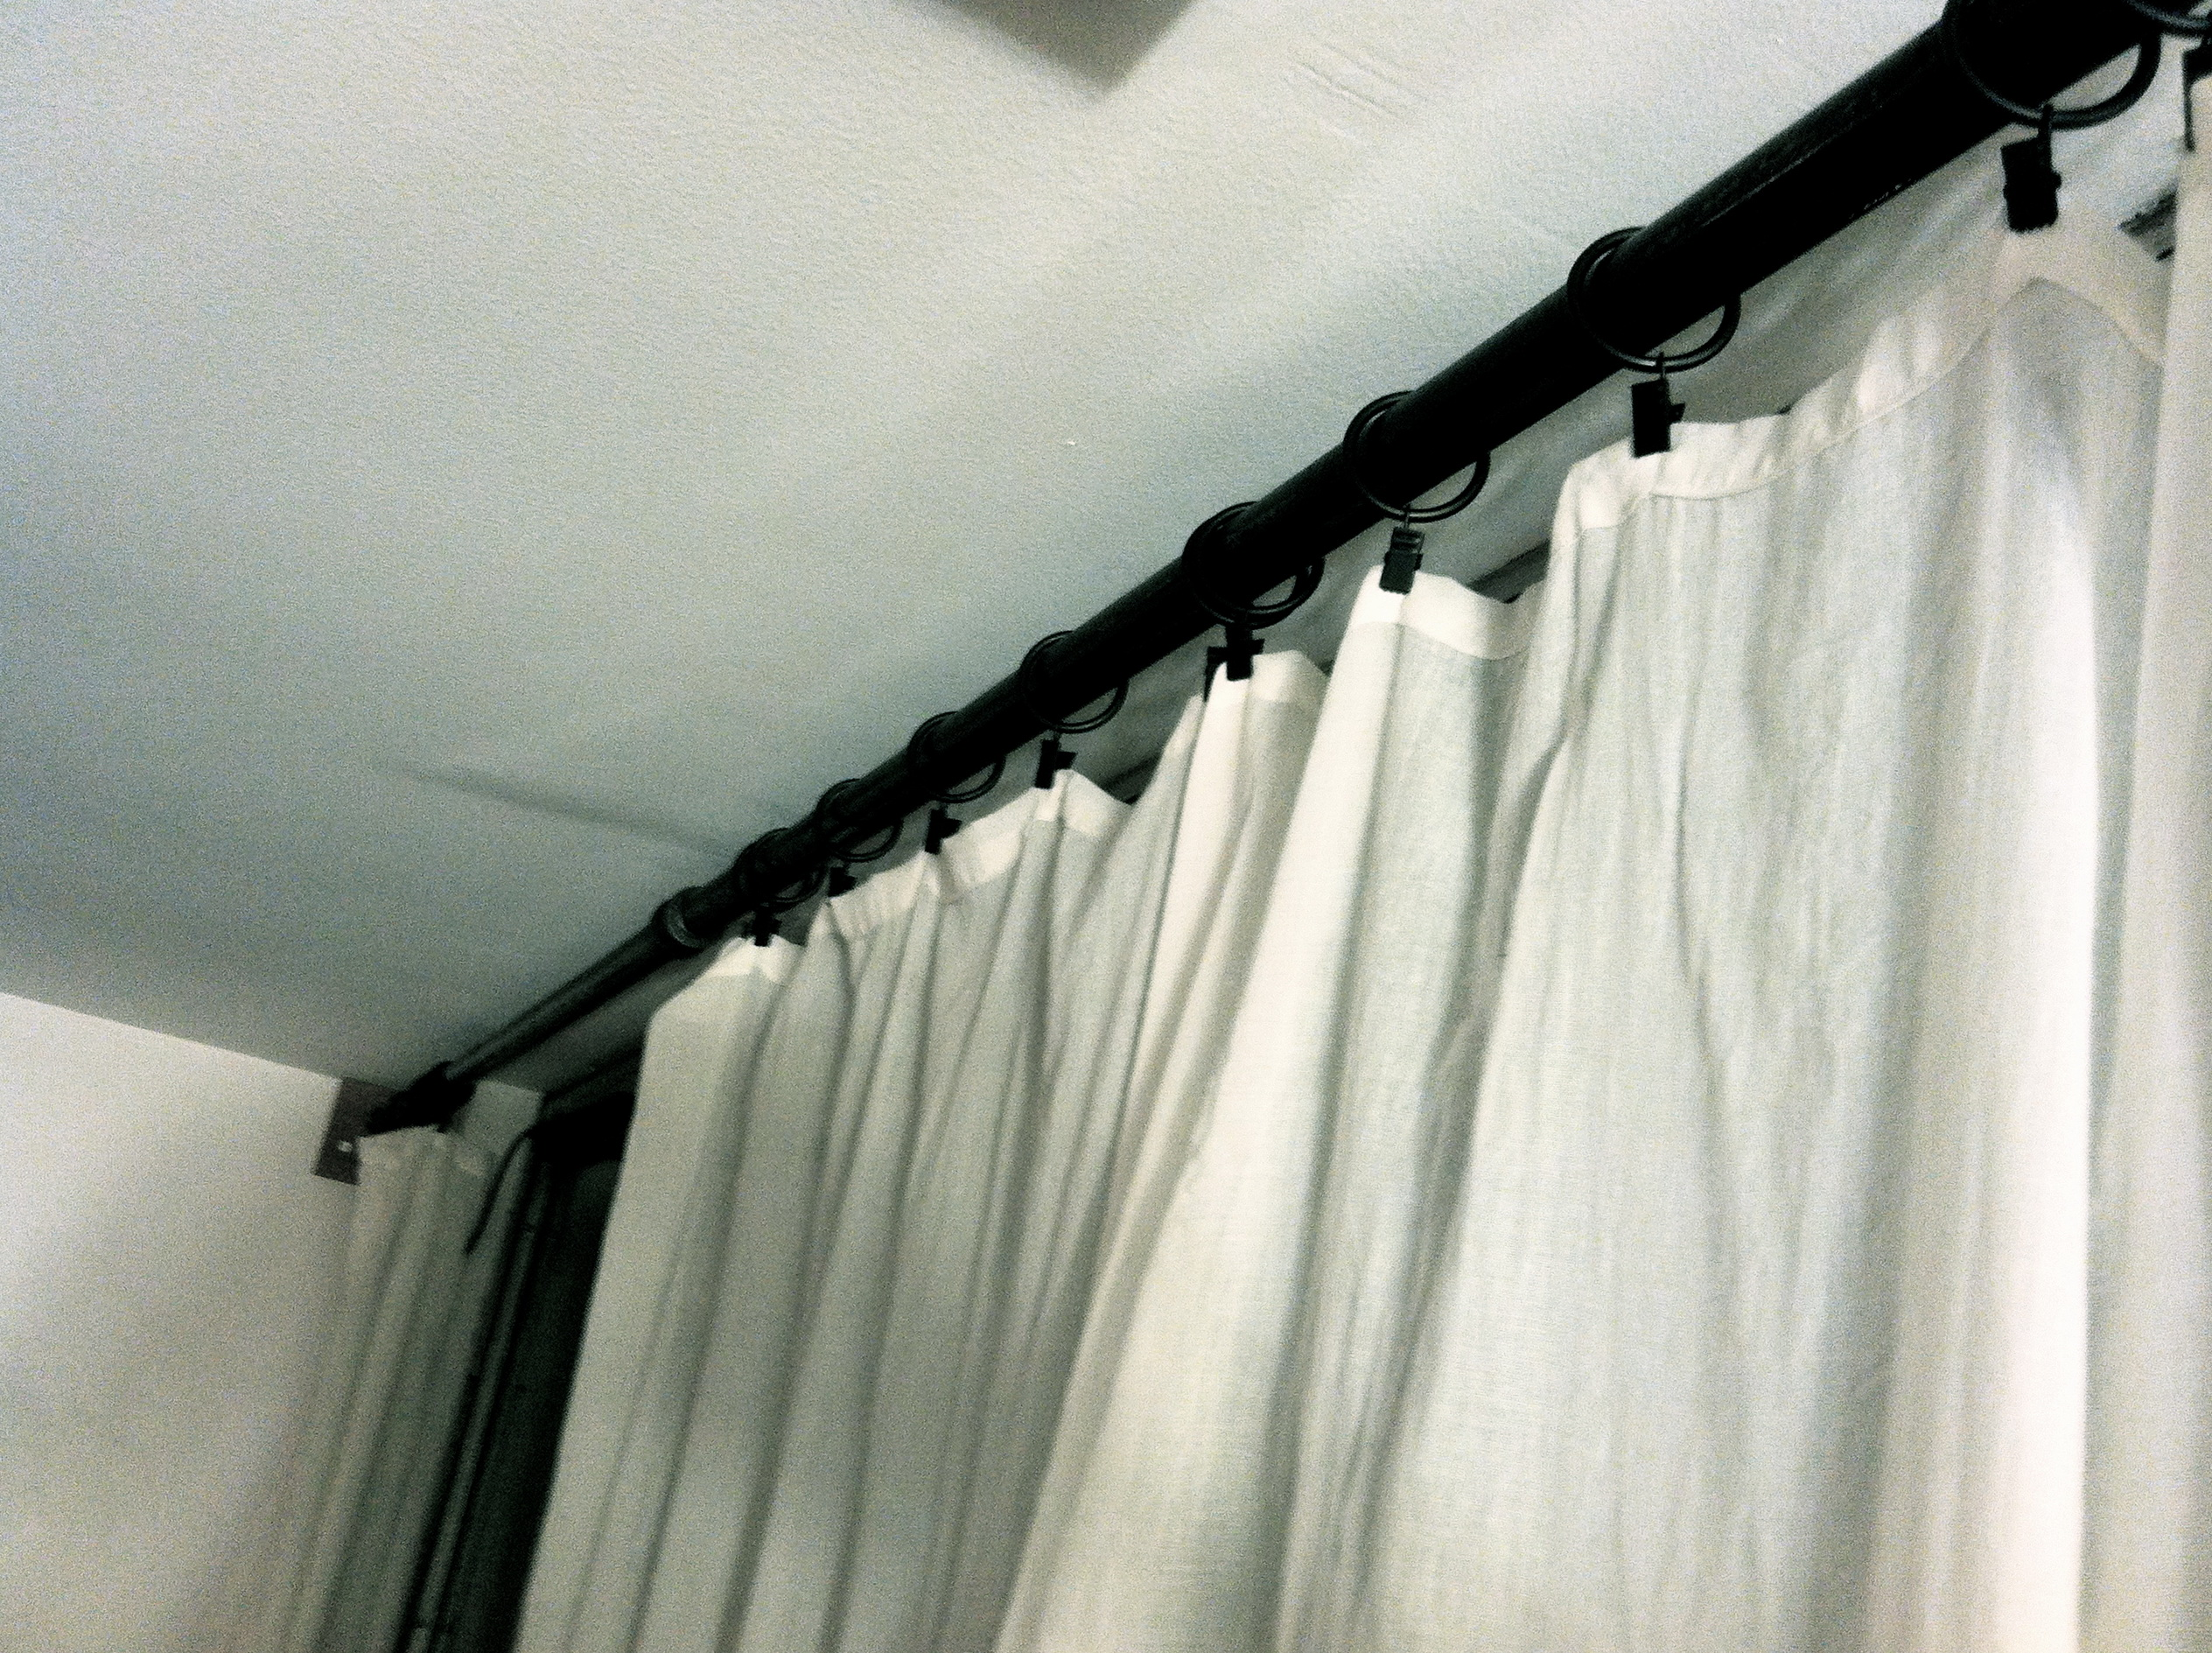 Pottery Barn Curtain Rods Iron